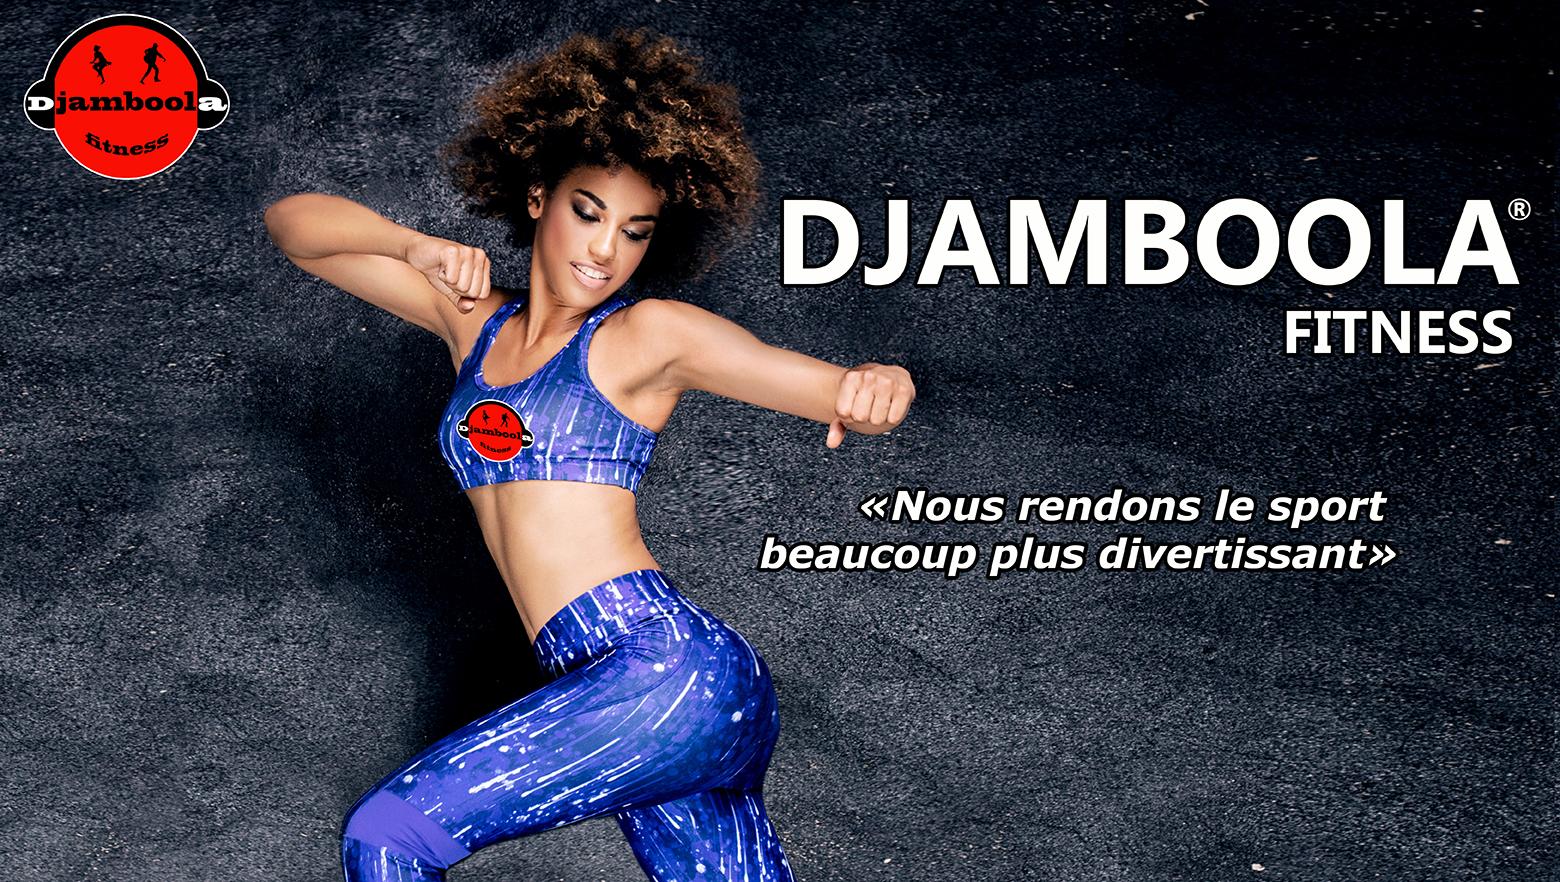 DJAMBOOLA Danse-Fitness